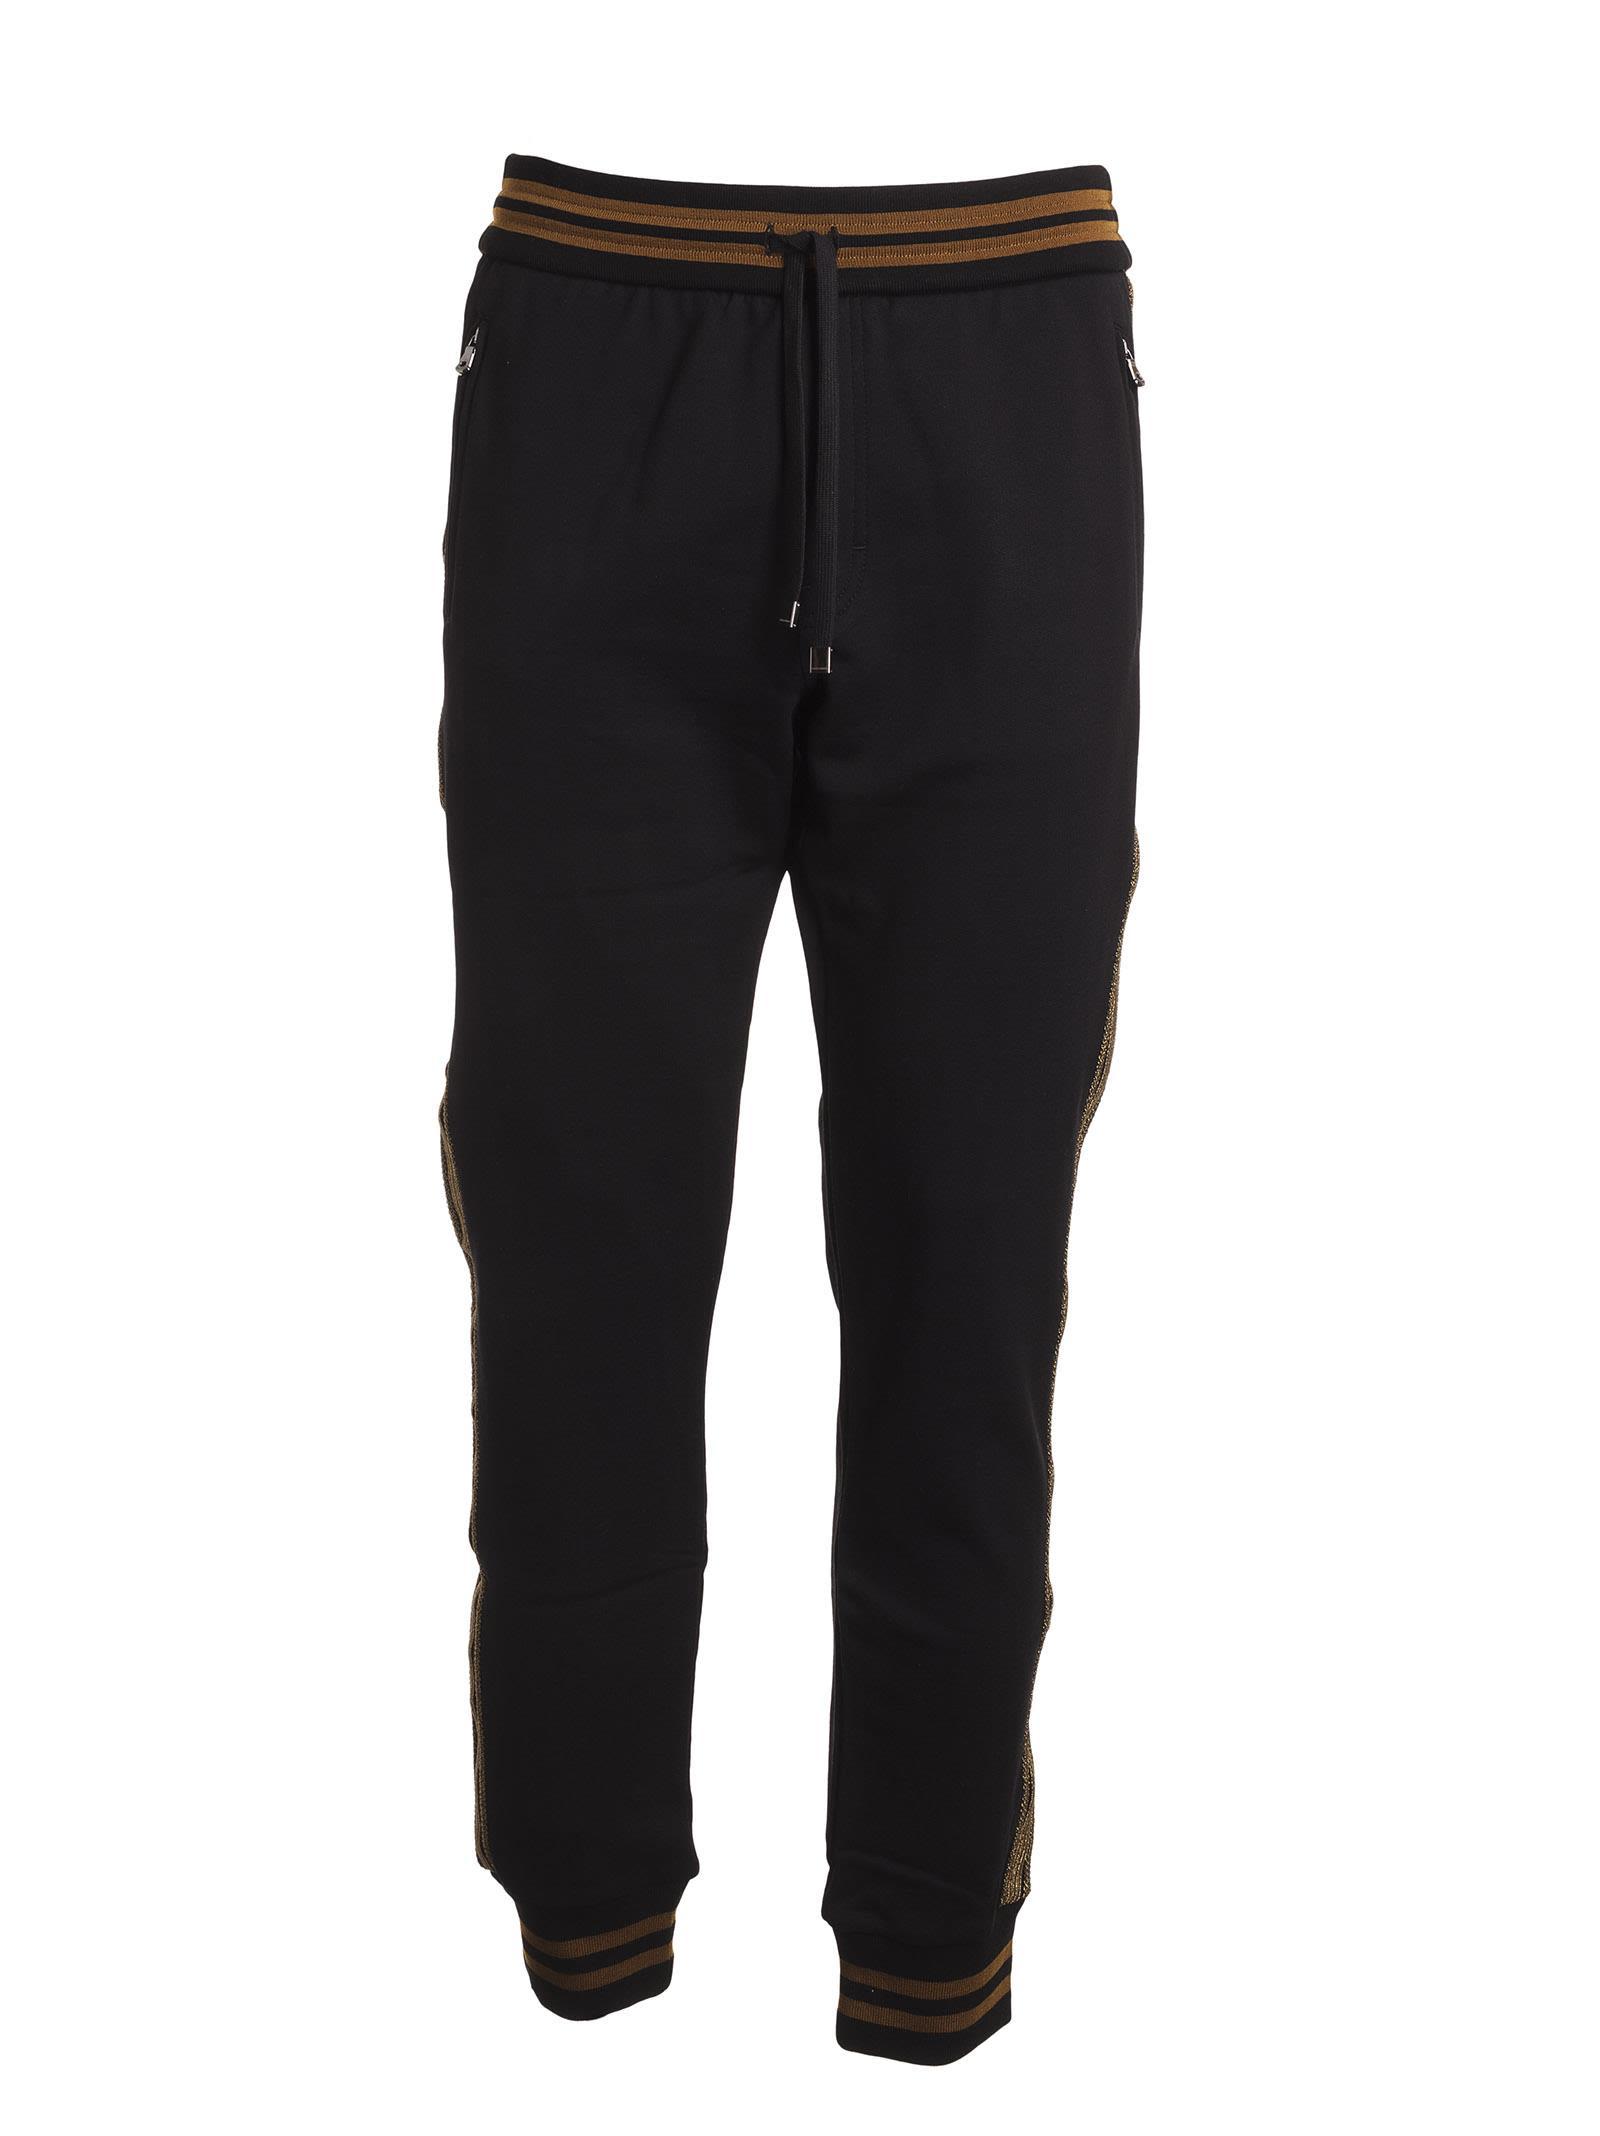 Dolce & Gabbana Heraldic Sicilia Track Pants